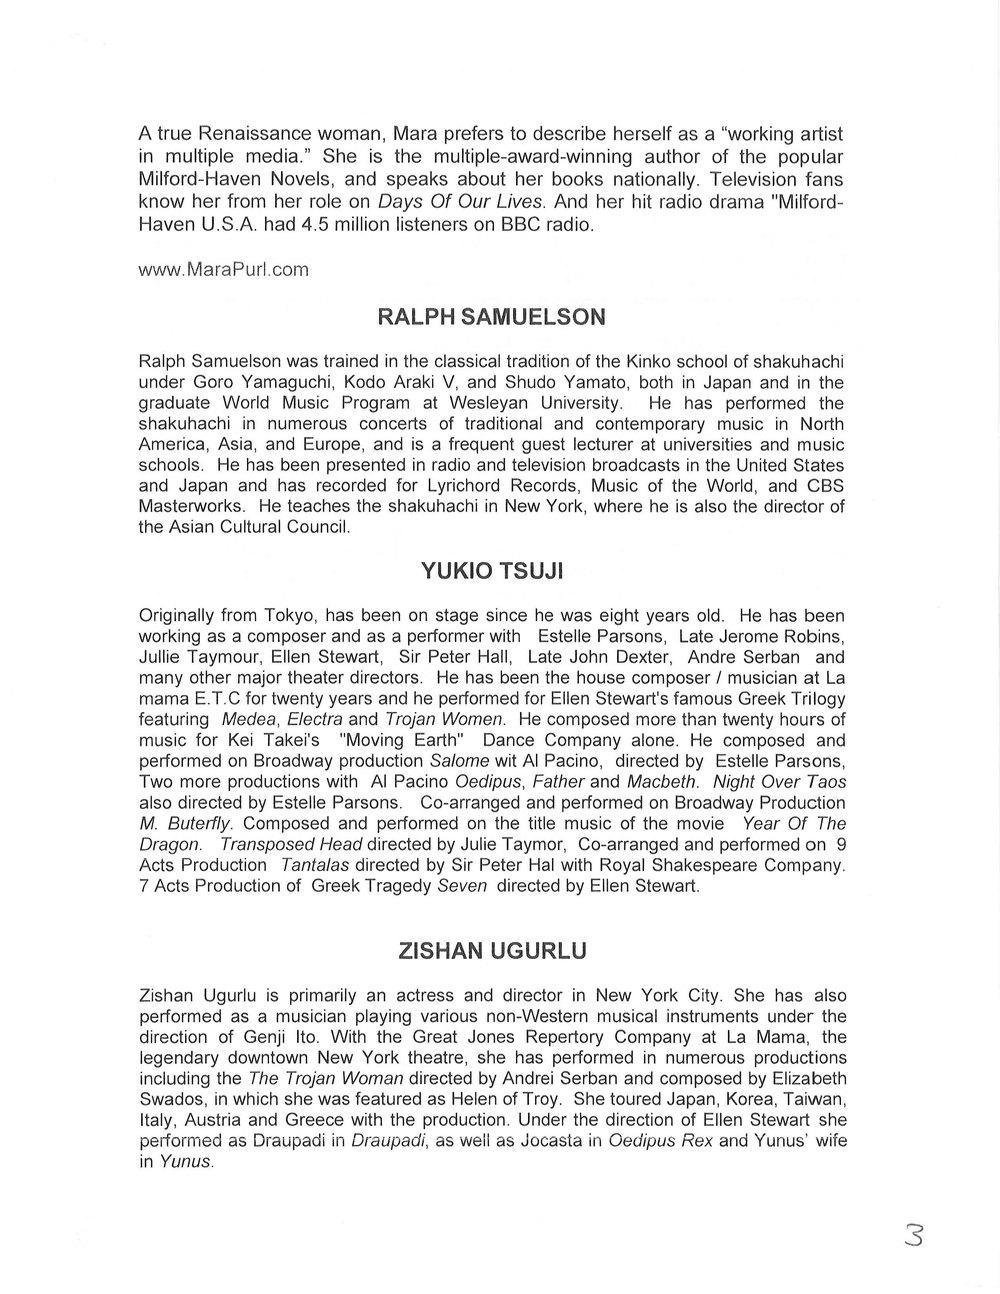 Compilation Dossier 582.jpg